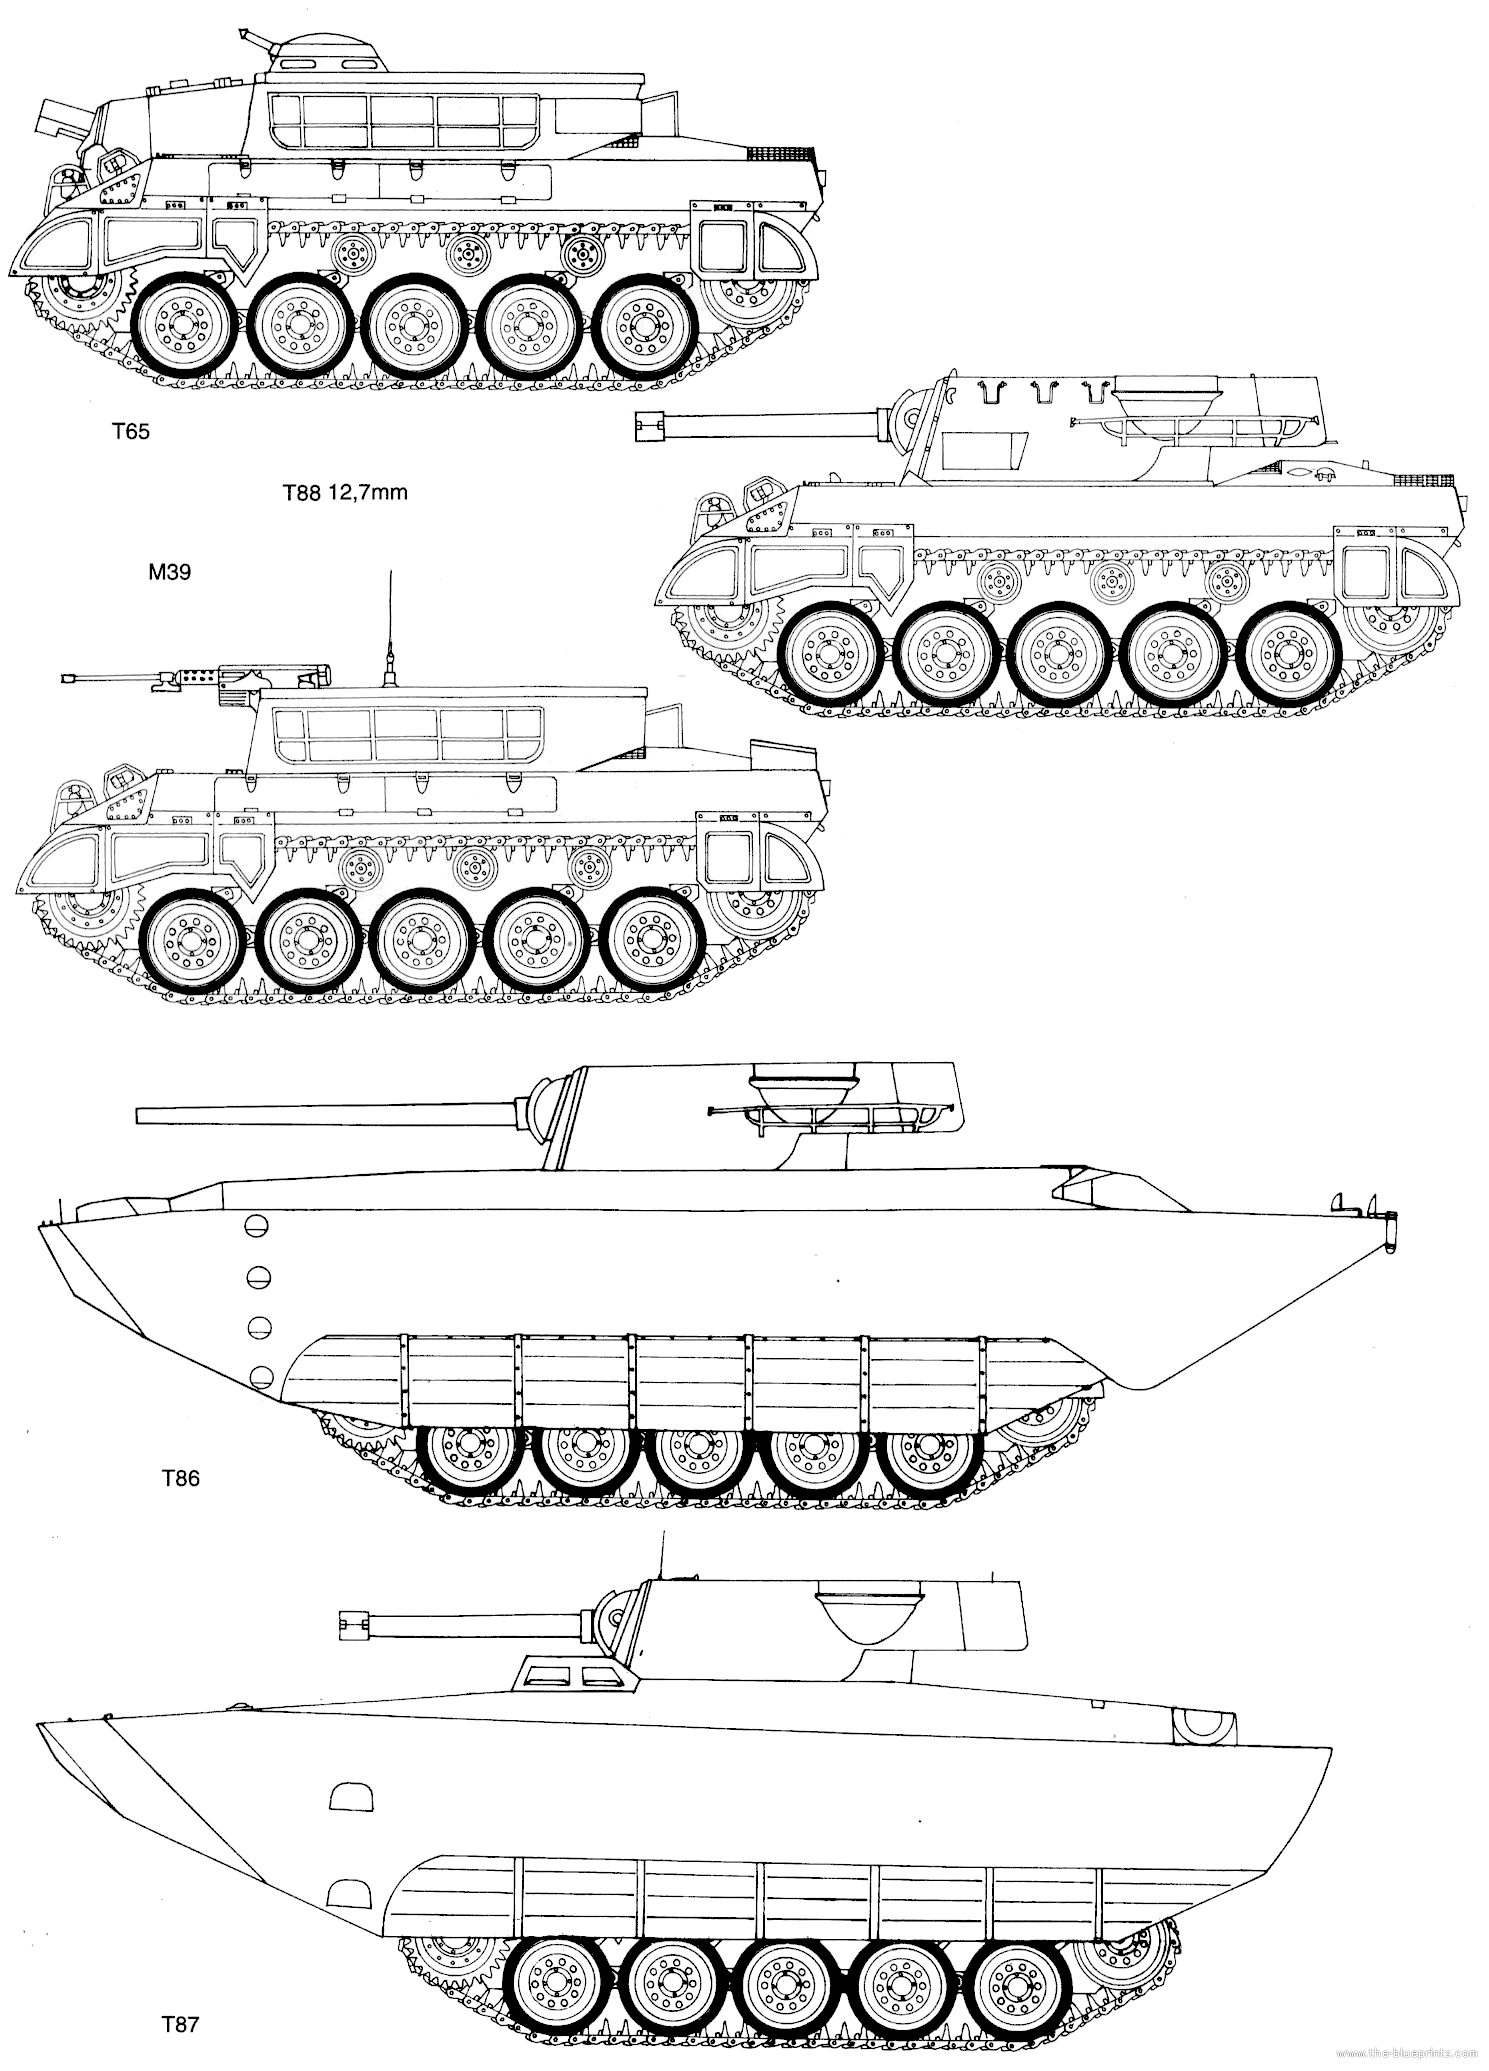 M18 Hellcat For Sale >> Blueprints > Tanks > Tanks M > M18 Hellcat